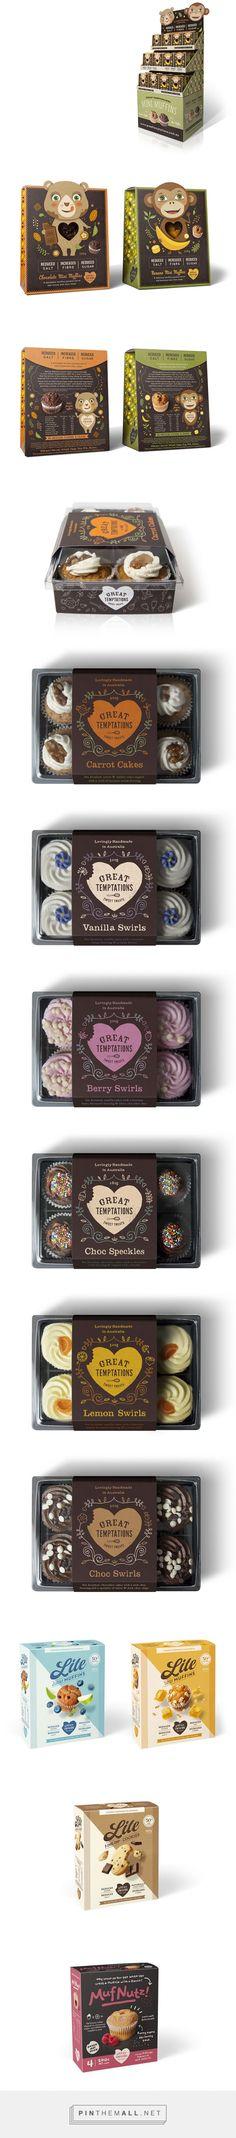 muffin packaging, cupcake packaging design | Dessein - created via http://pinthemall.net